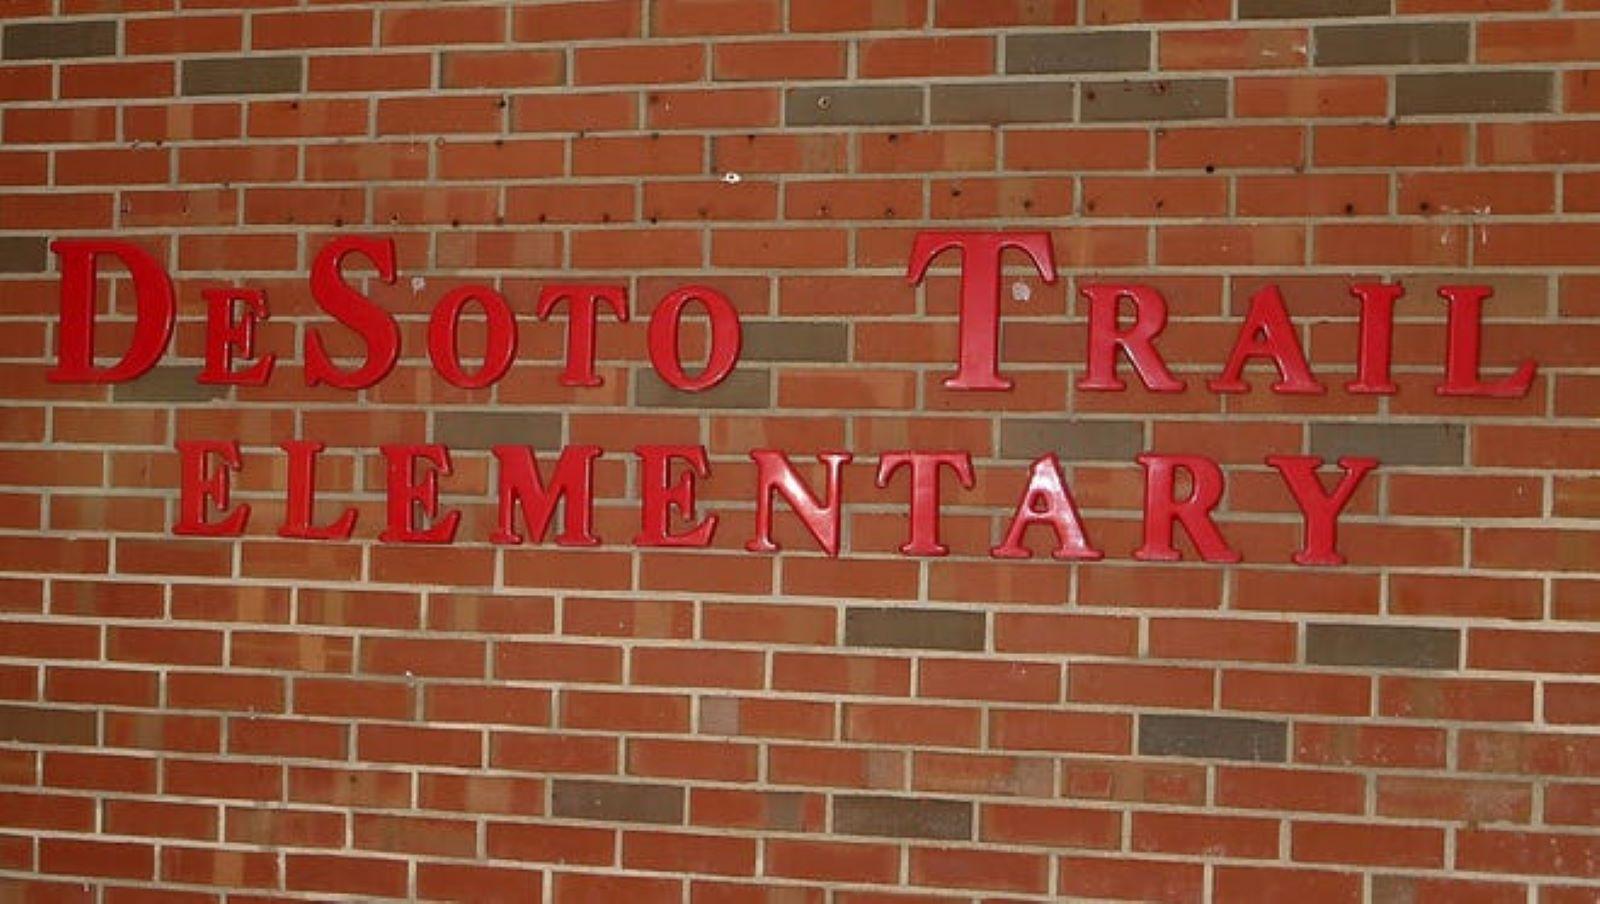 De Soto Trail Elementary